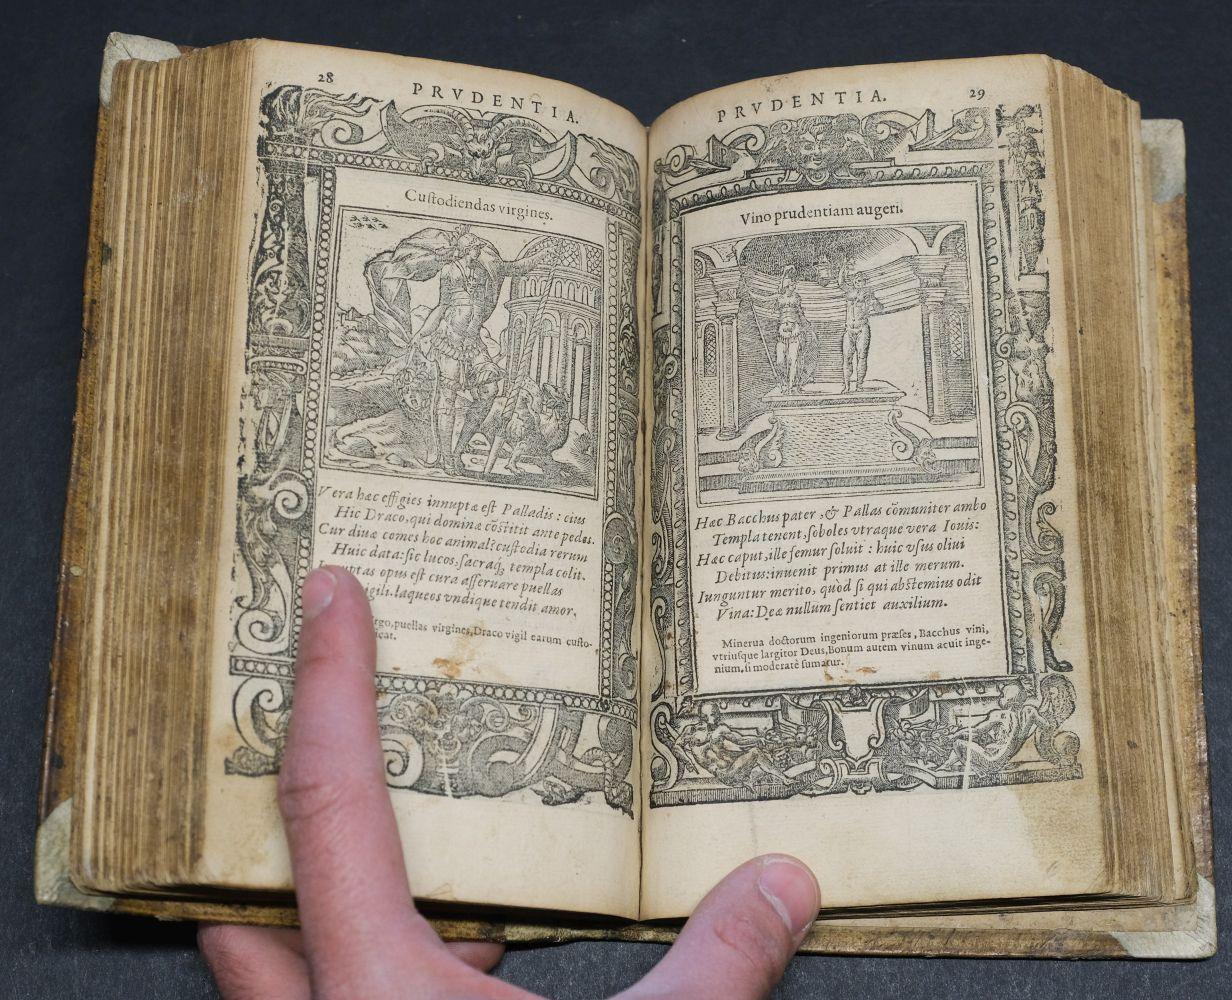 Sambucus (Joannes). Emblemata, Antwerp: Christopher Plantin, 1564 - Image 10 of 11